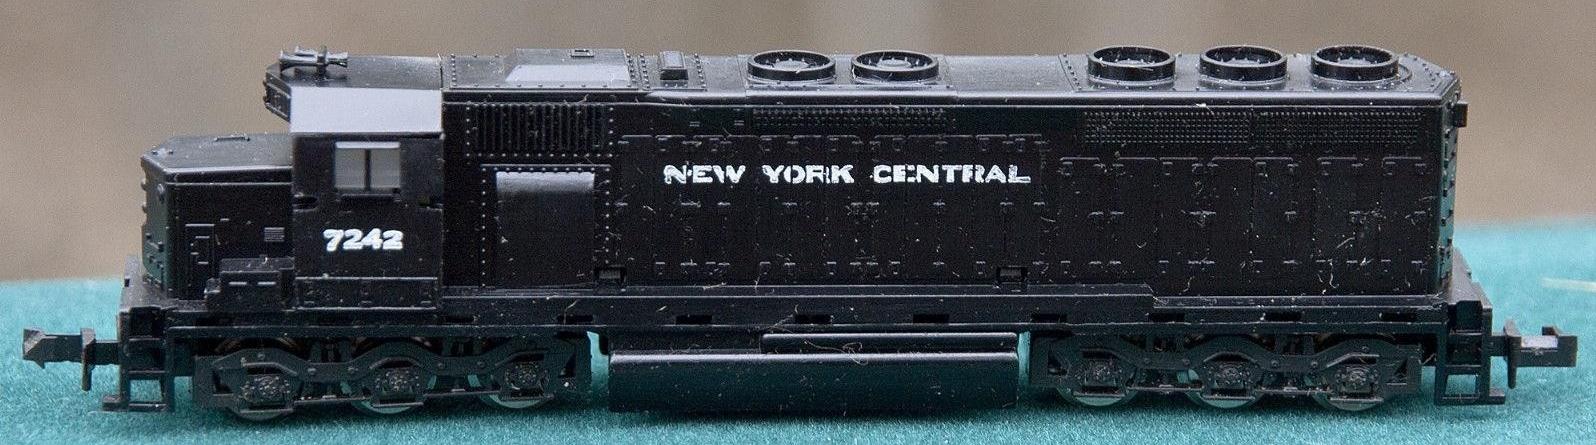 N Scale - Con-Cor - 2201-H - Locomotive, Diesel, EMD SD45 - New York Central - 7242